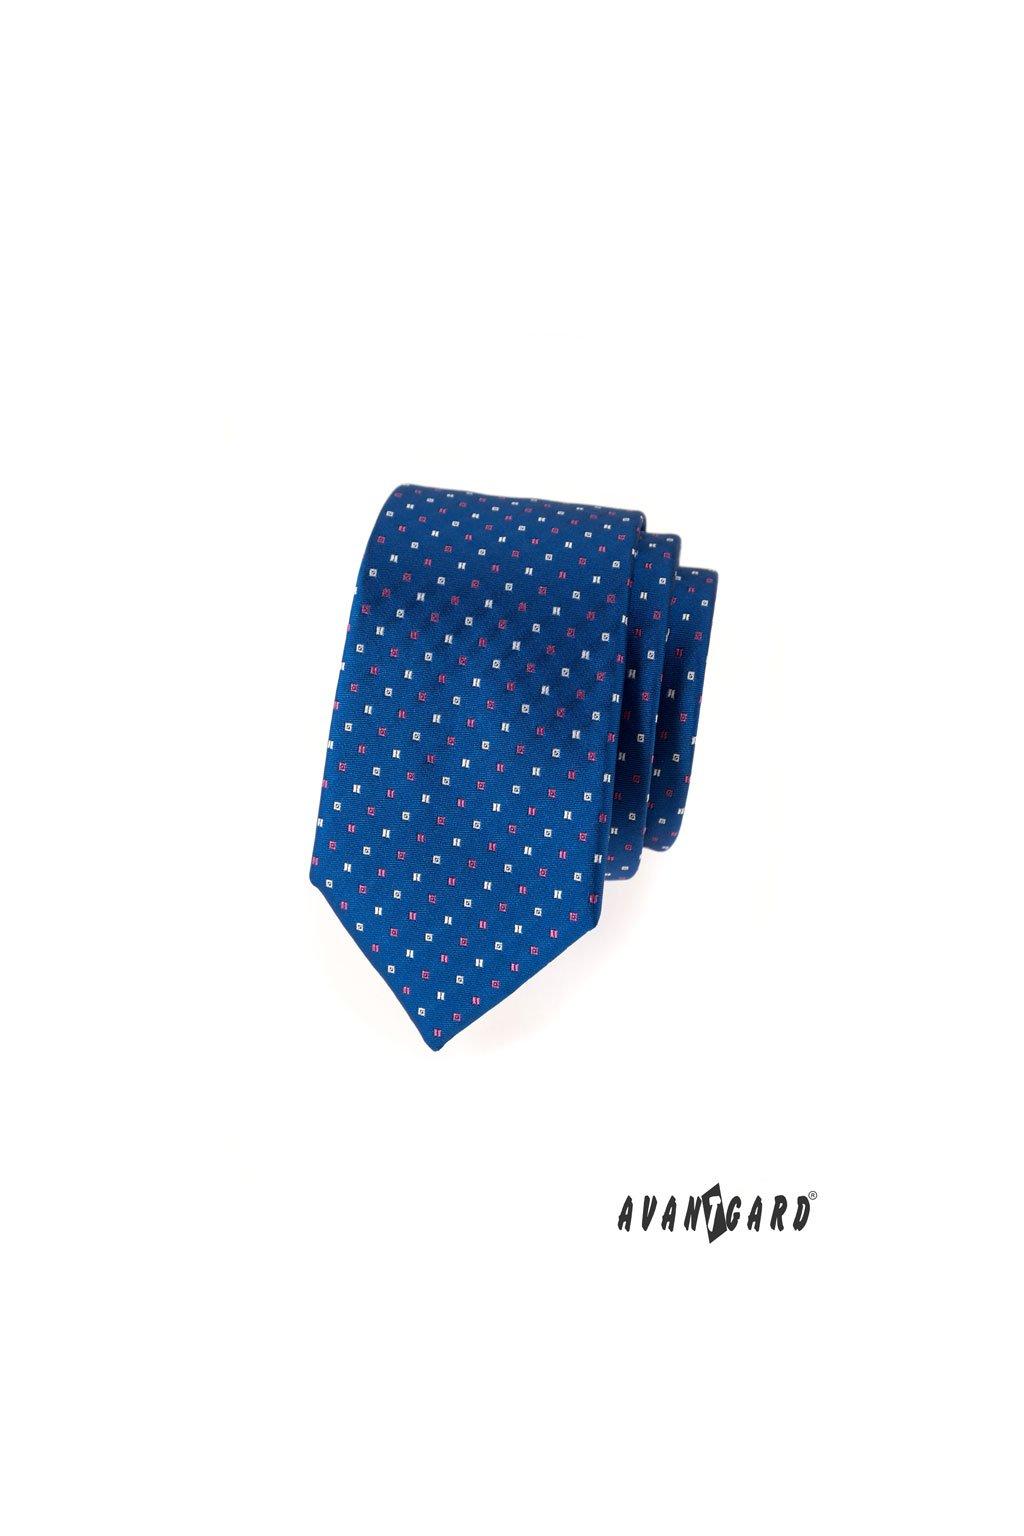 Modrá slim kravata – decentní diagonální vzor